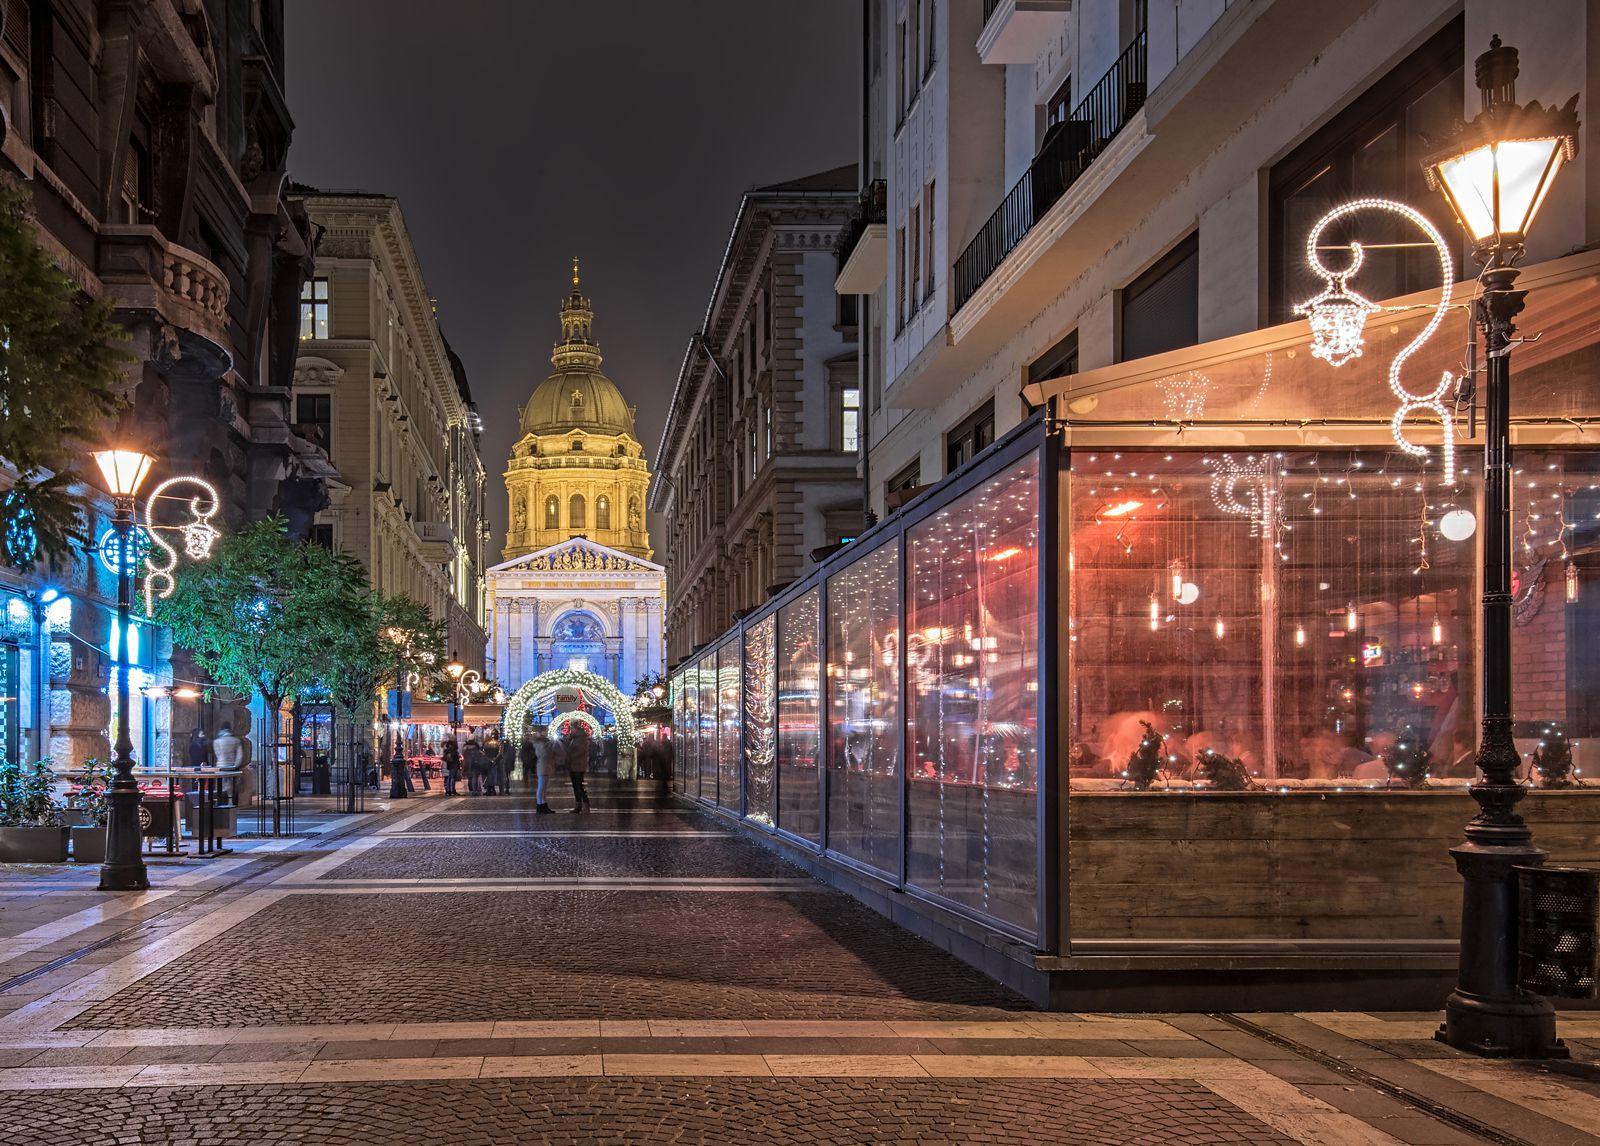 2021/01/Advent-Budimpešta-7.jpg